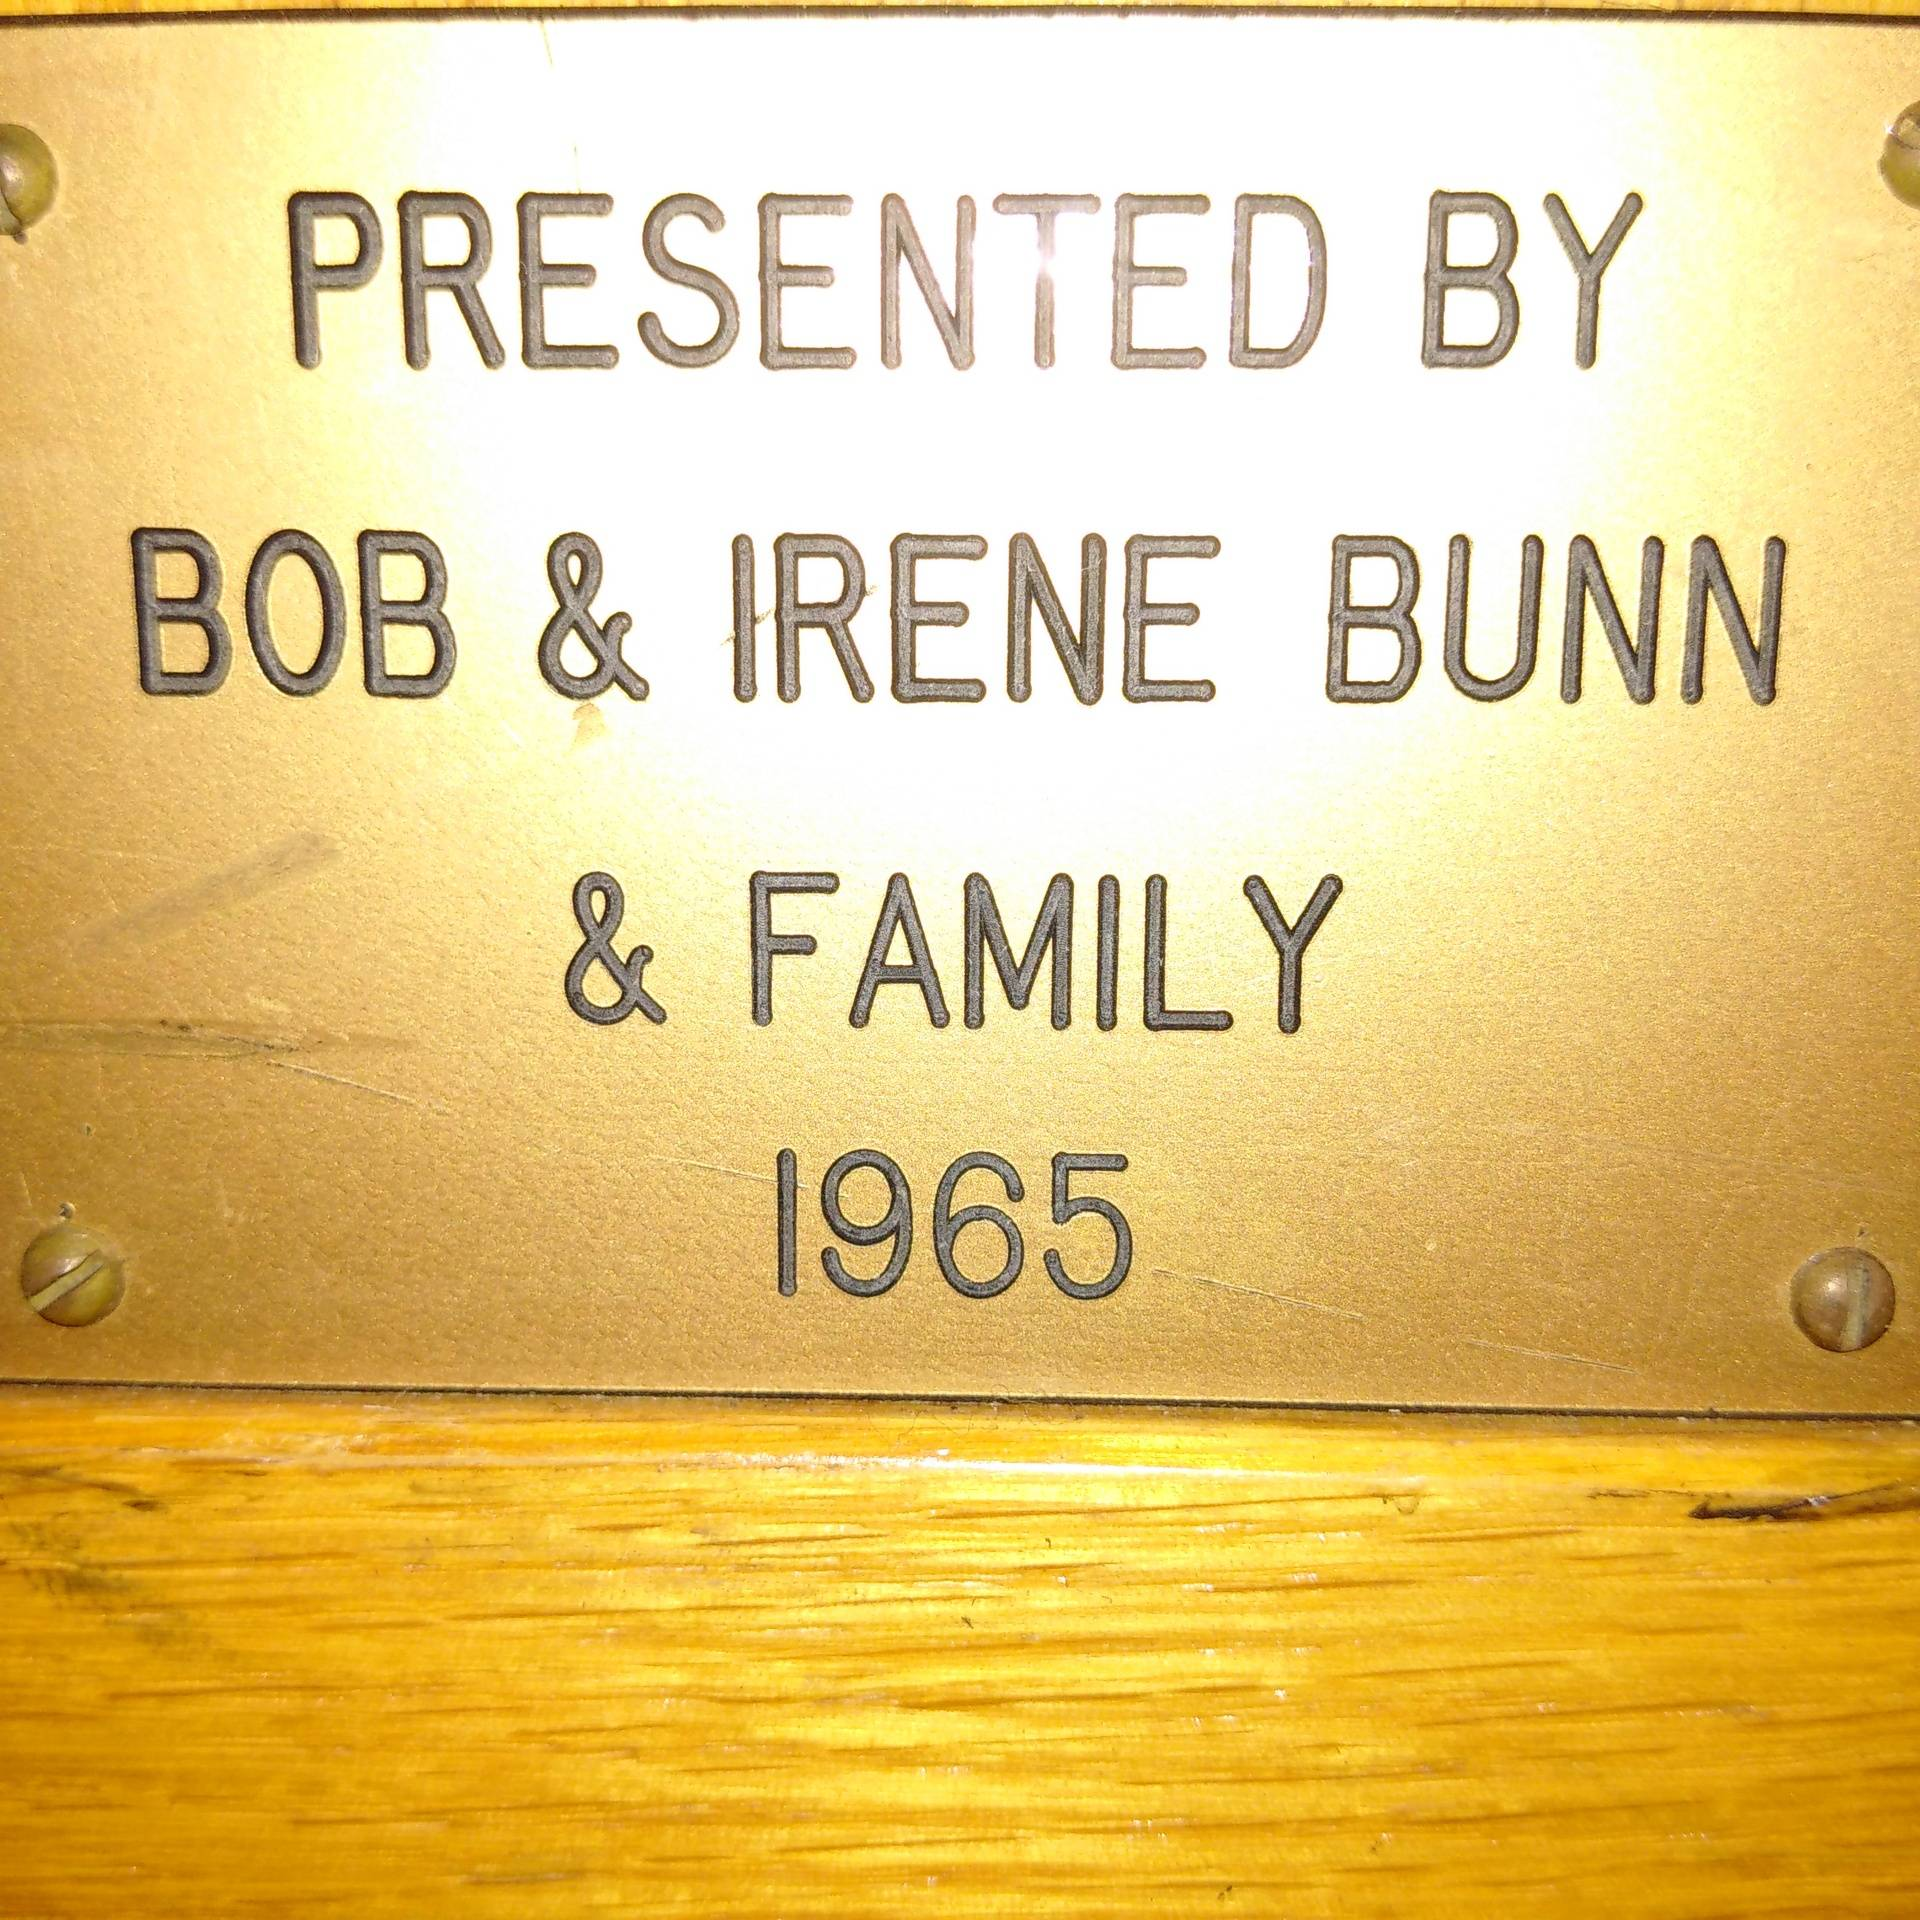 Bob & Irene Bunn and Family 1965